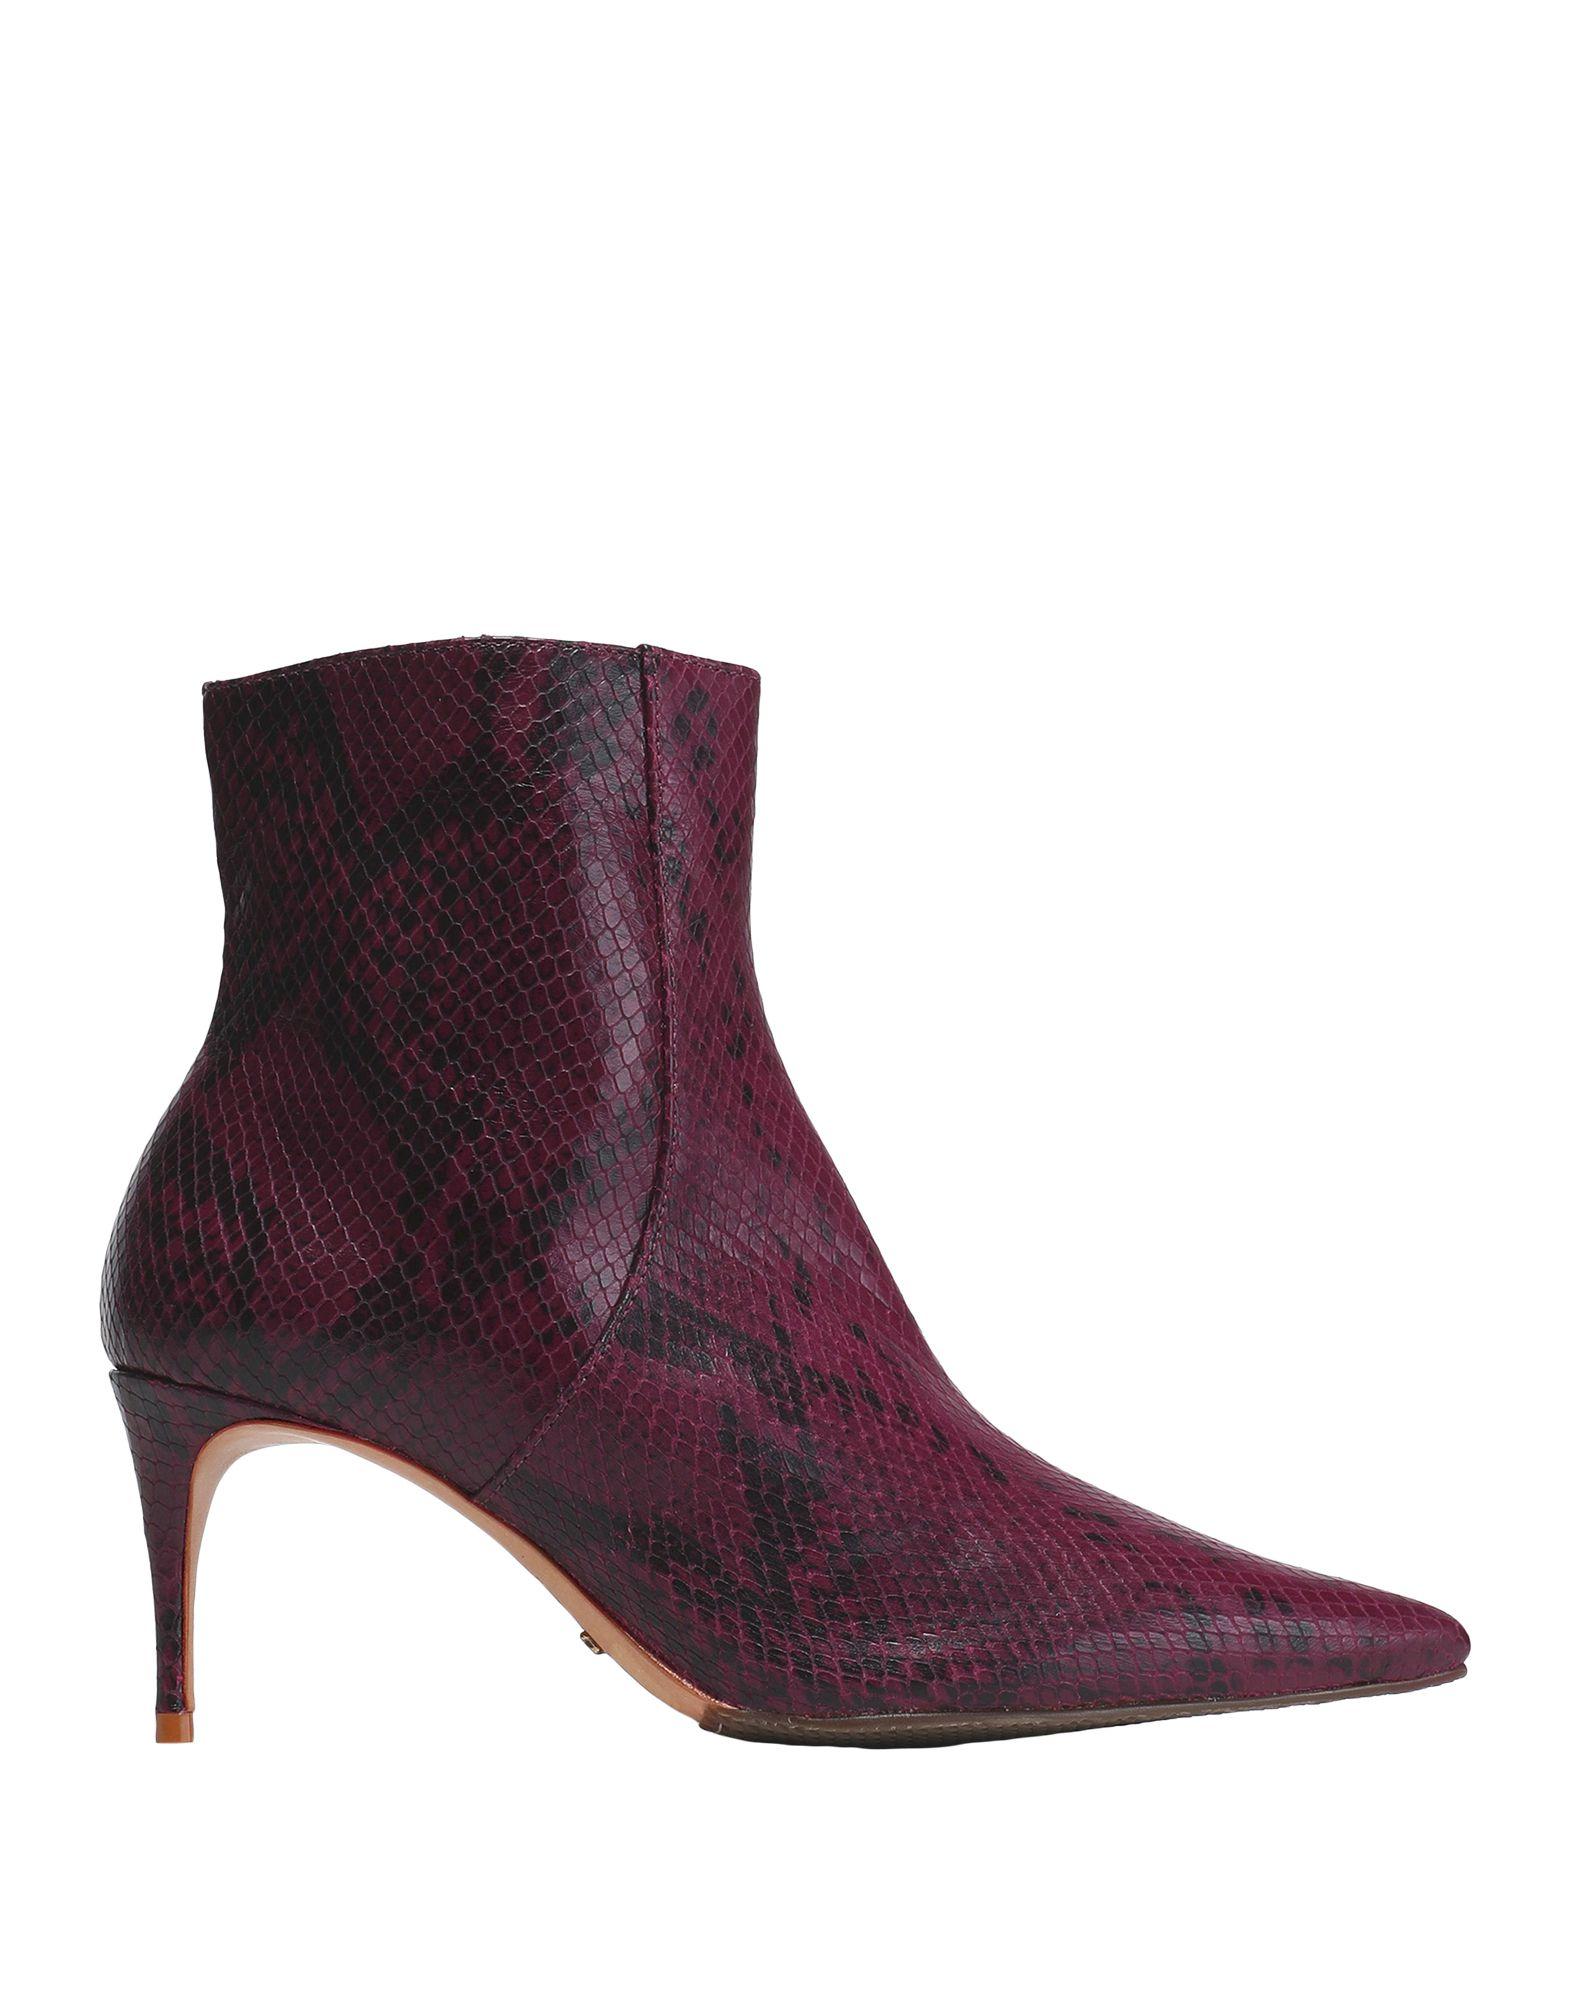 Burdeos Botín Schutz Mujer - - - Botines Schutz Zapatos casuales salvajes 44404b